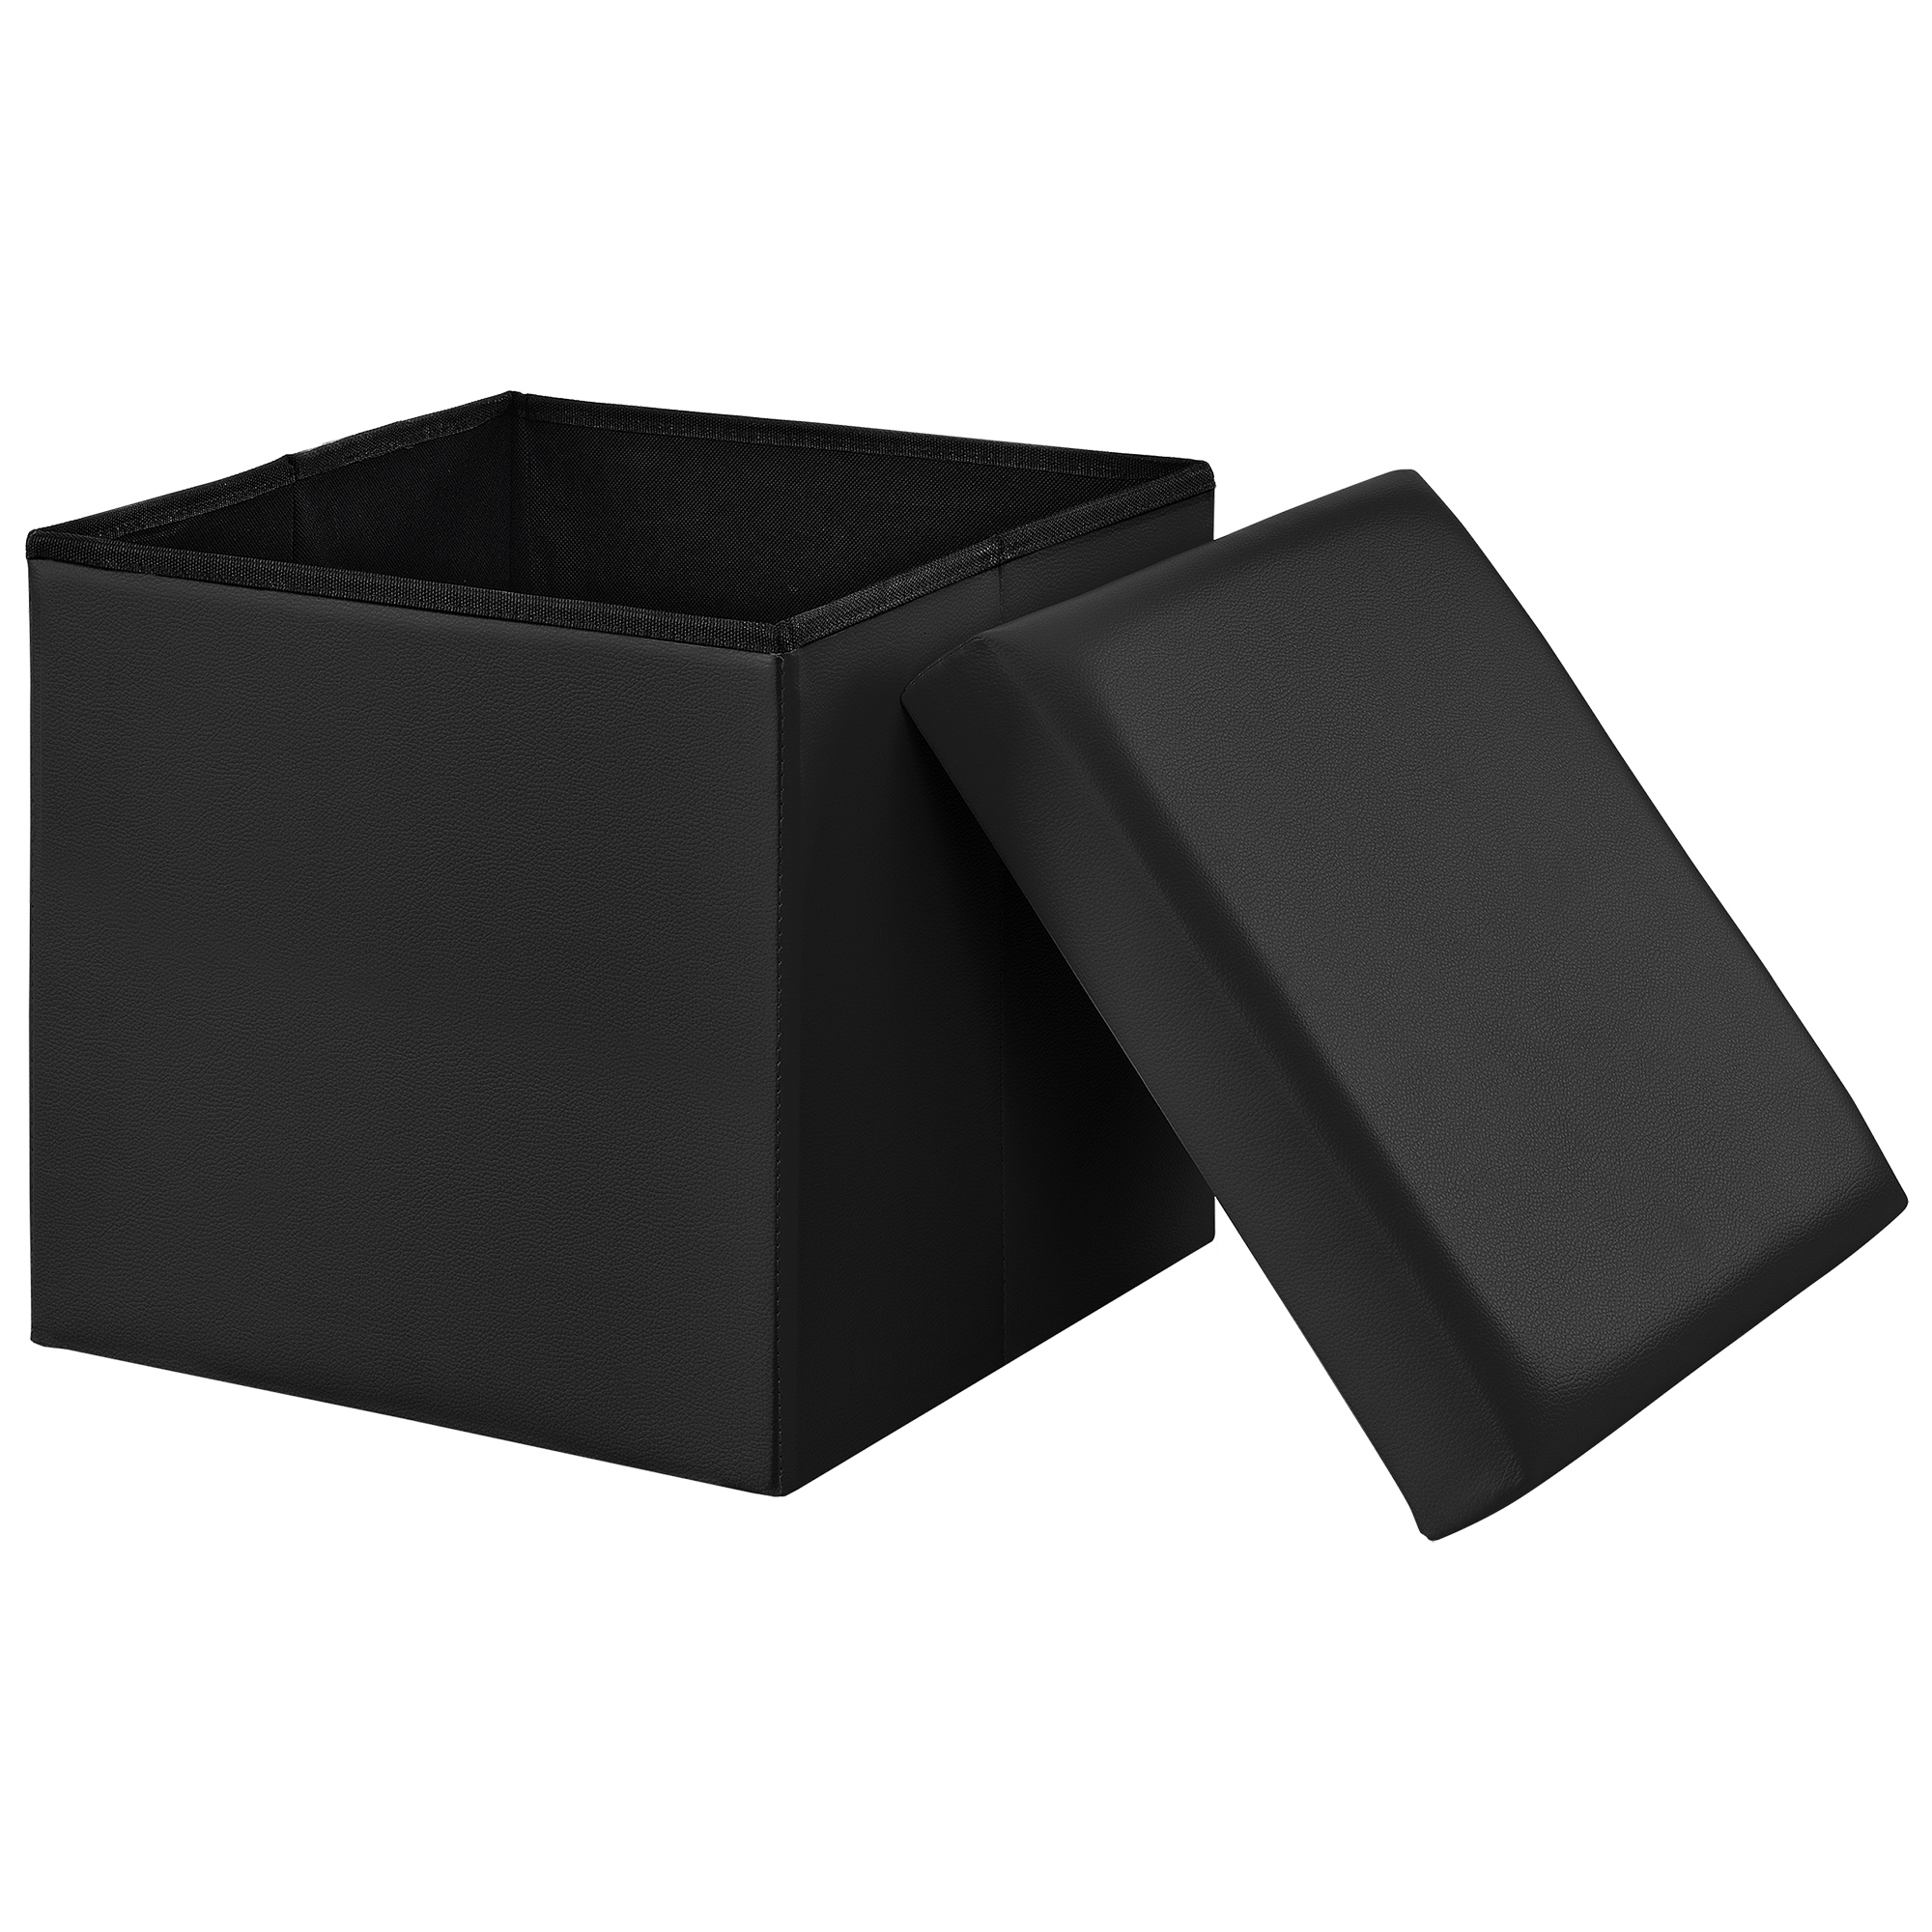 [en.casa]® Skládací taburet - koženka - černý - 38 x 38 x 38 cm